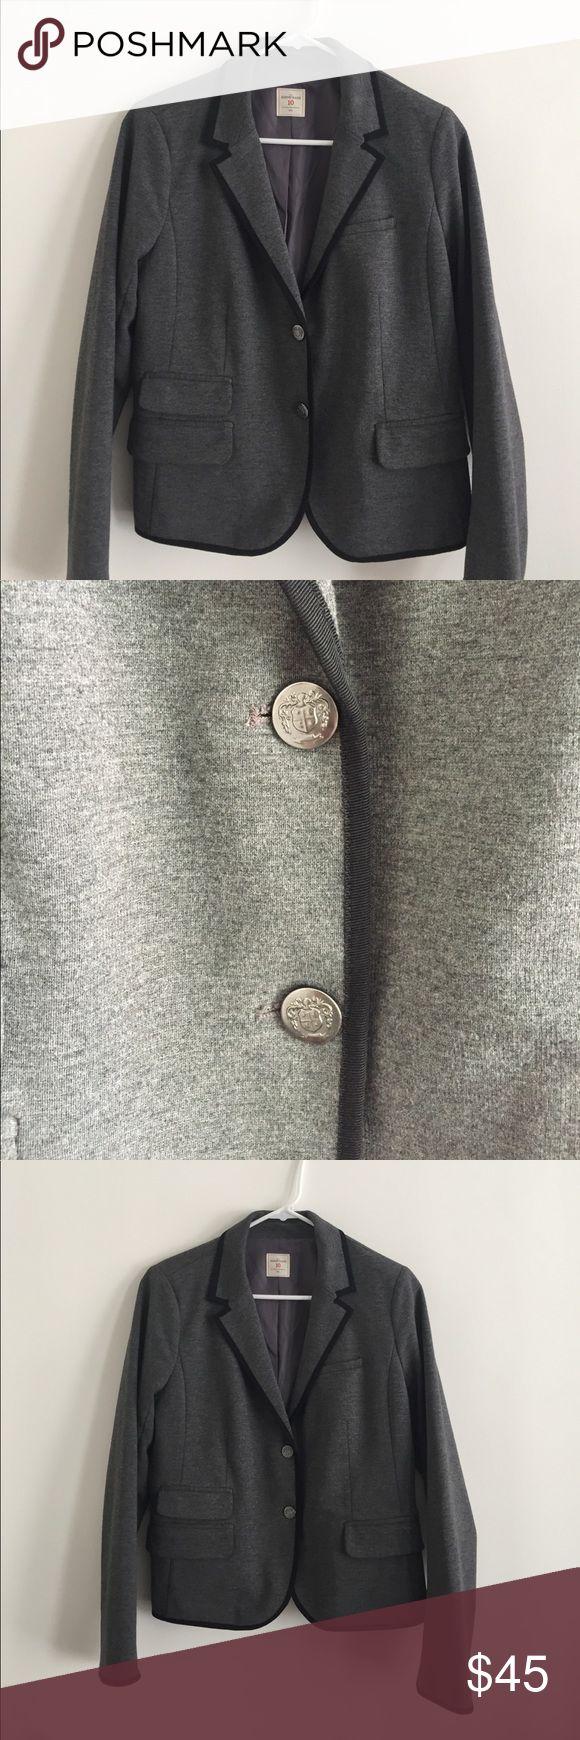 Academy Blazer by Gap Fully lined blazer in heather gray. Polyester spandex fabric. Worn once. GAP Jackets & Coats Blazers